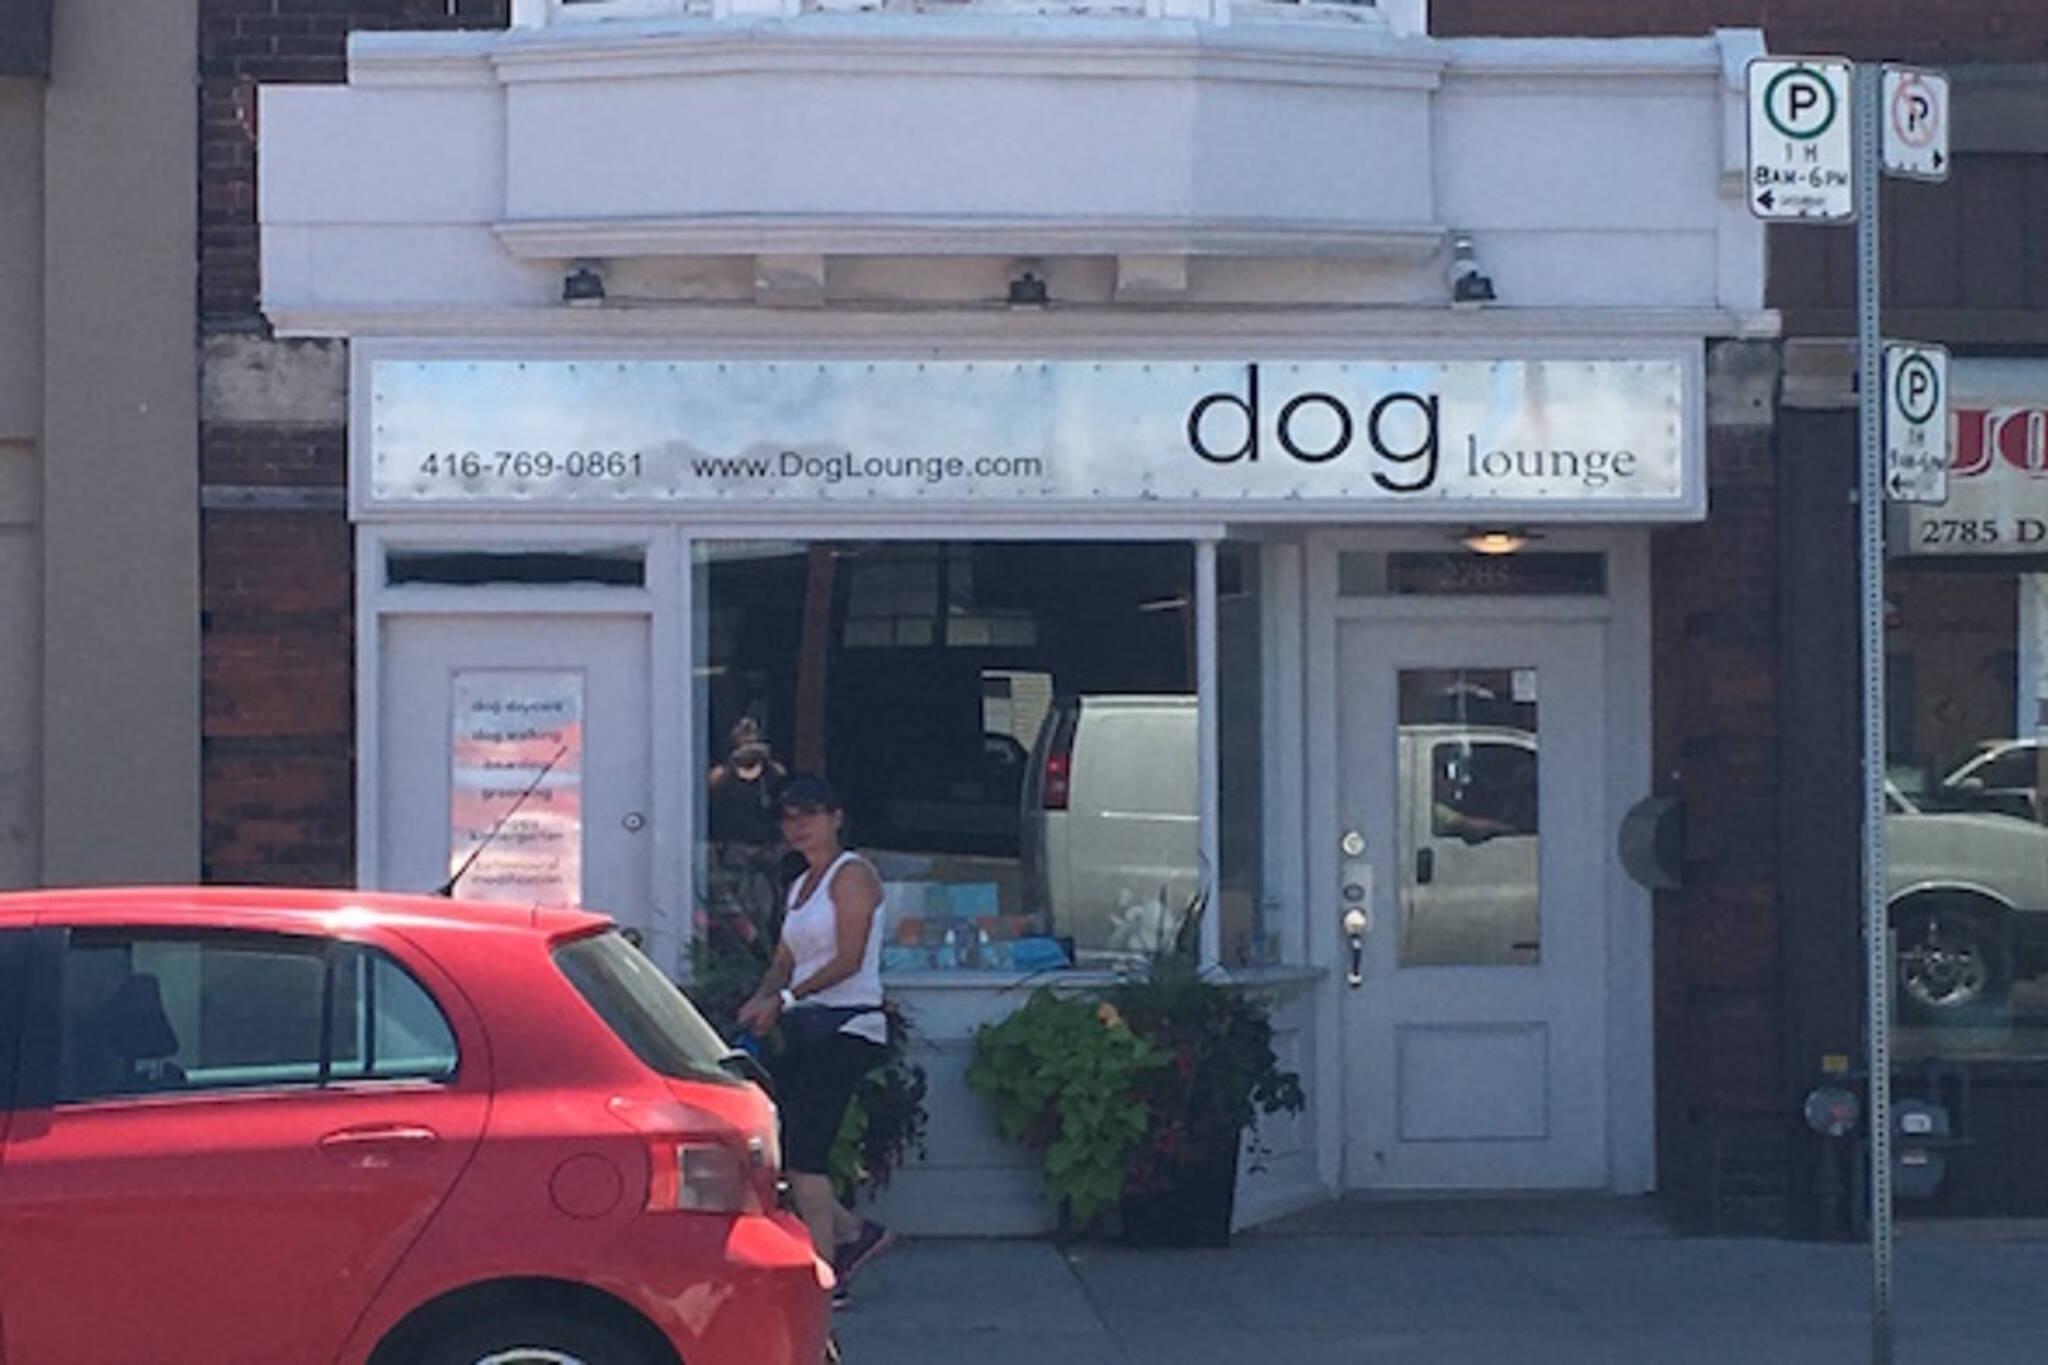 Dog Lounge Toronto